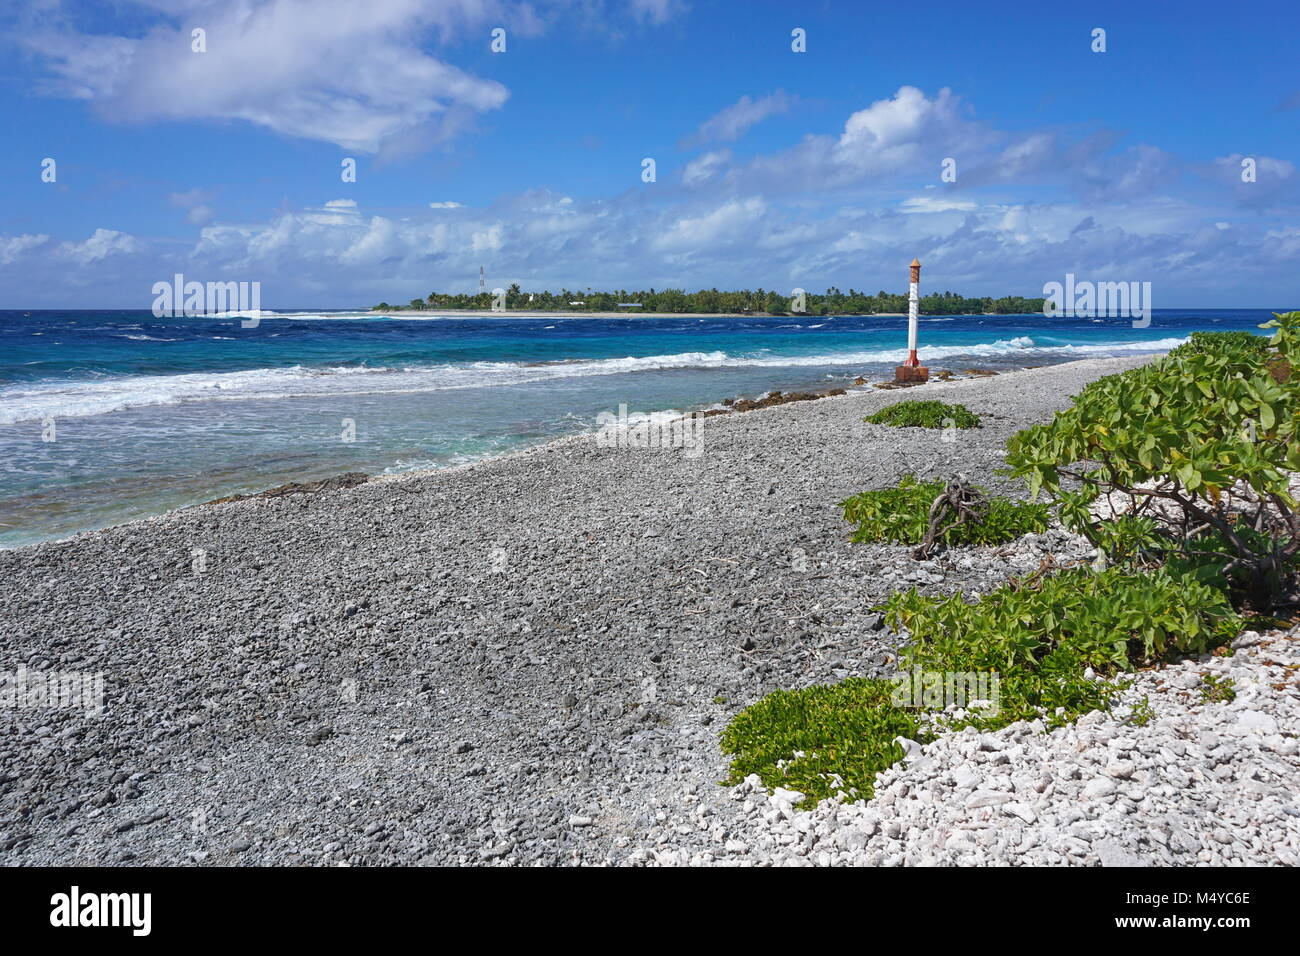 French Polynesia, atoll of Rangiroa the Tiputa channel, Tuamotus, south Pacific ocean - Stock Image